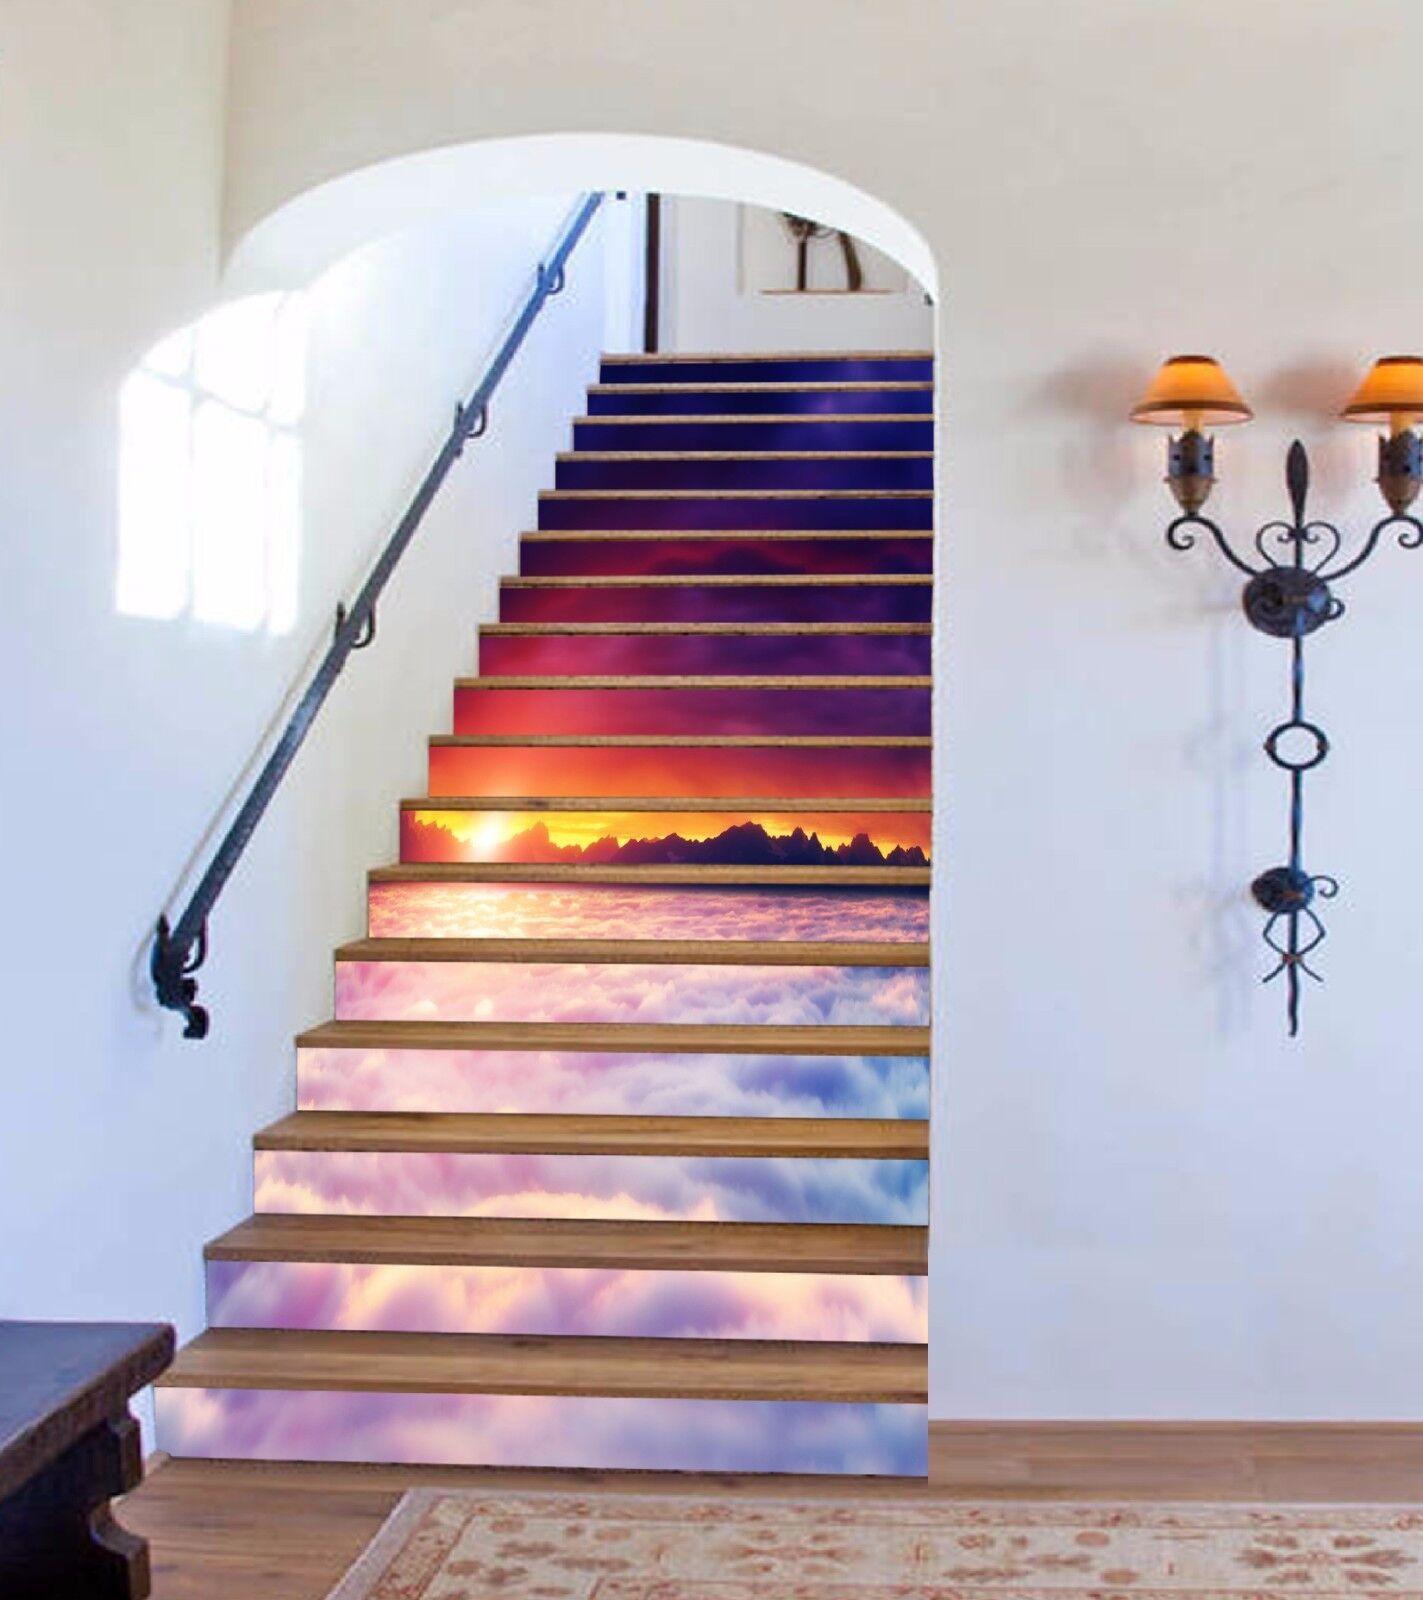 3D Sky Sea 872 Stair Risers Decoration Photo Mural Vinyl Decal Wallpaper UK